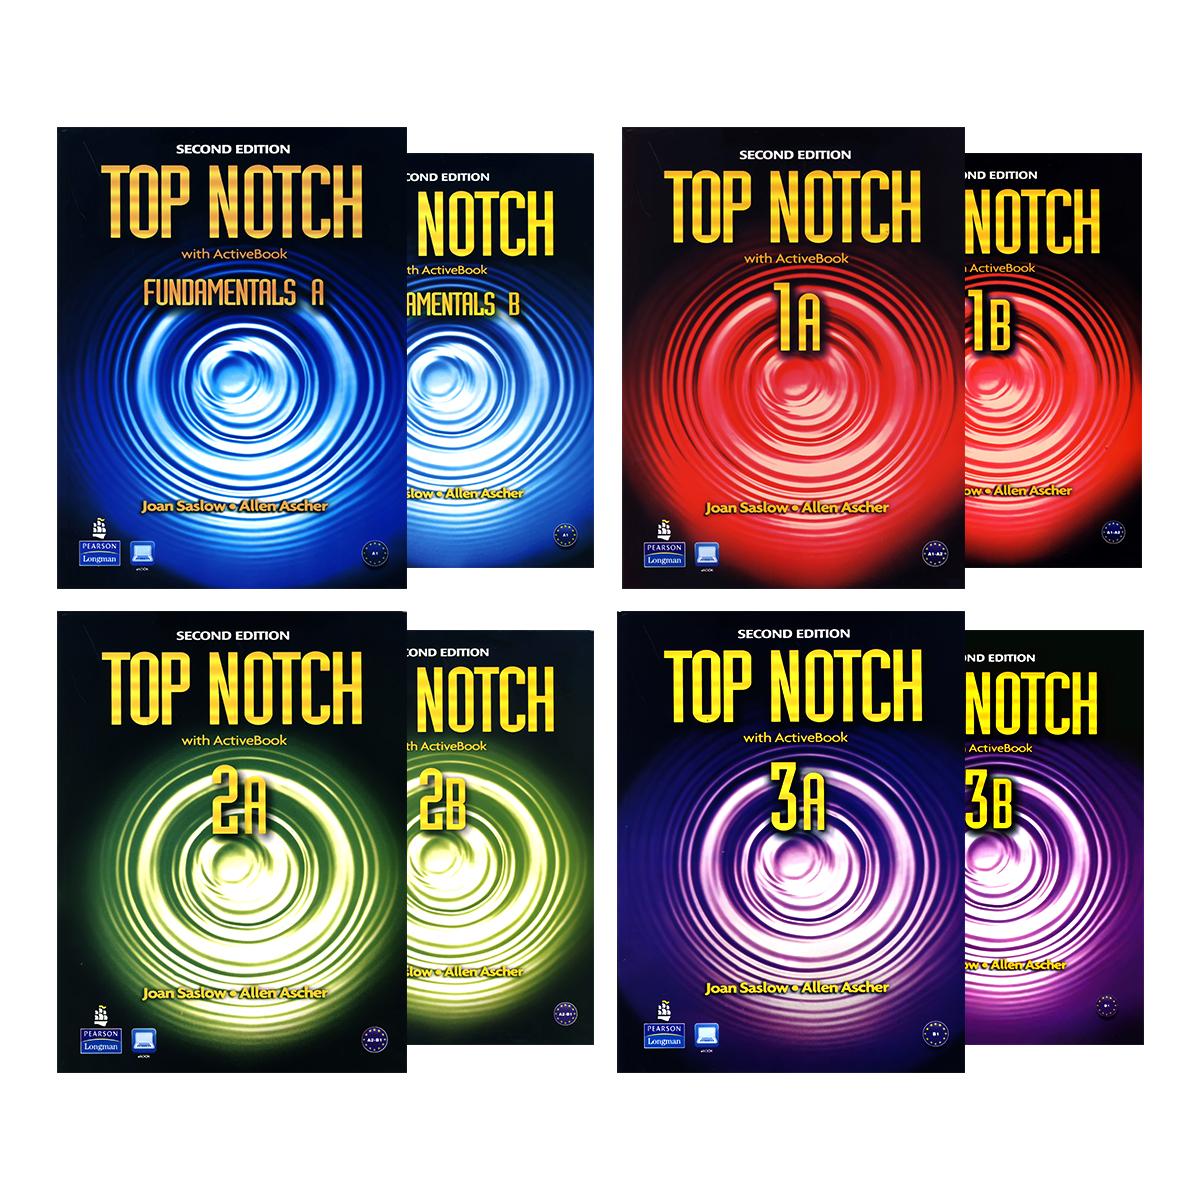 Top Notch Second Edition Book Series – فروشگاه انتشارات زبان مهر